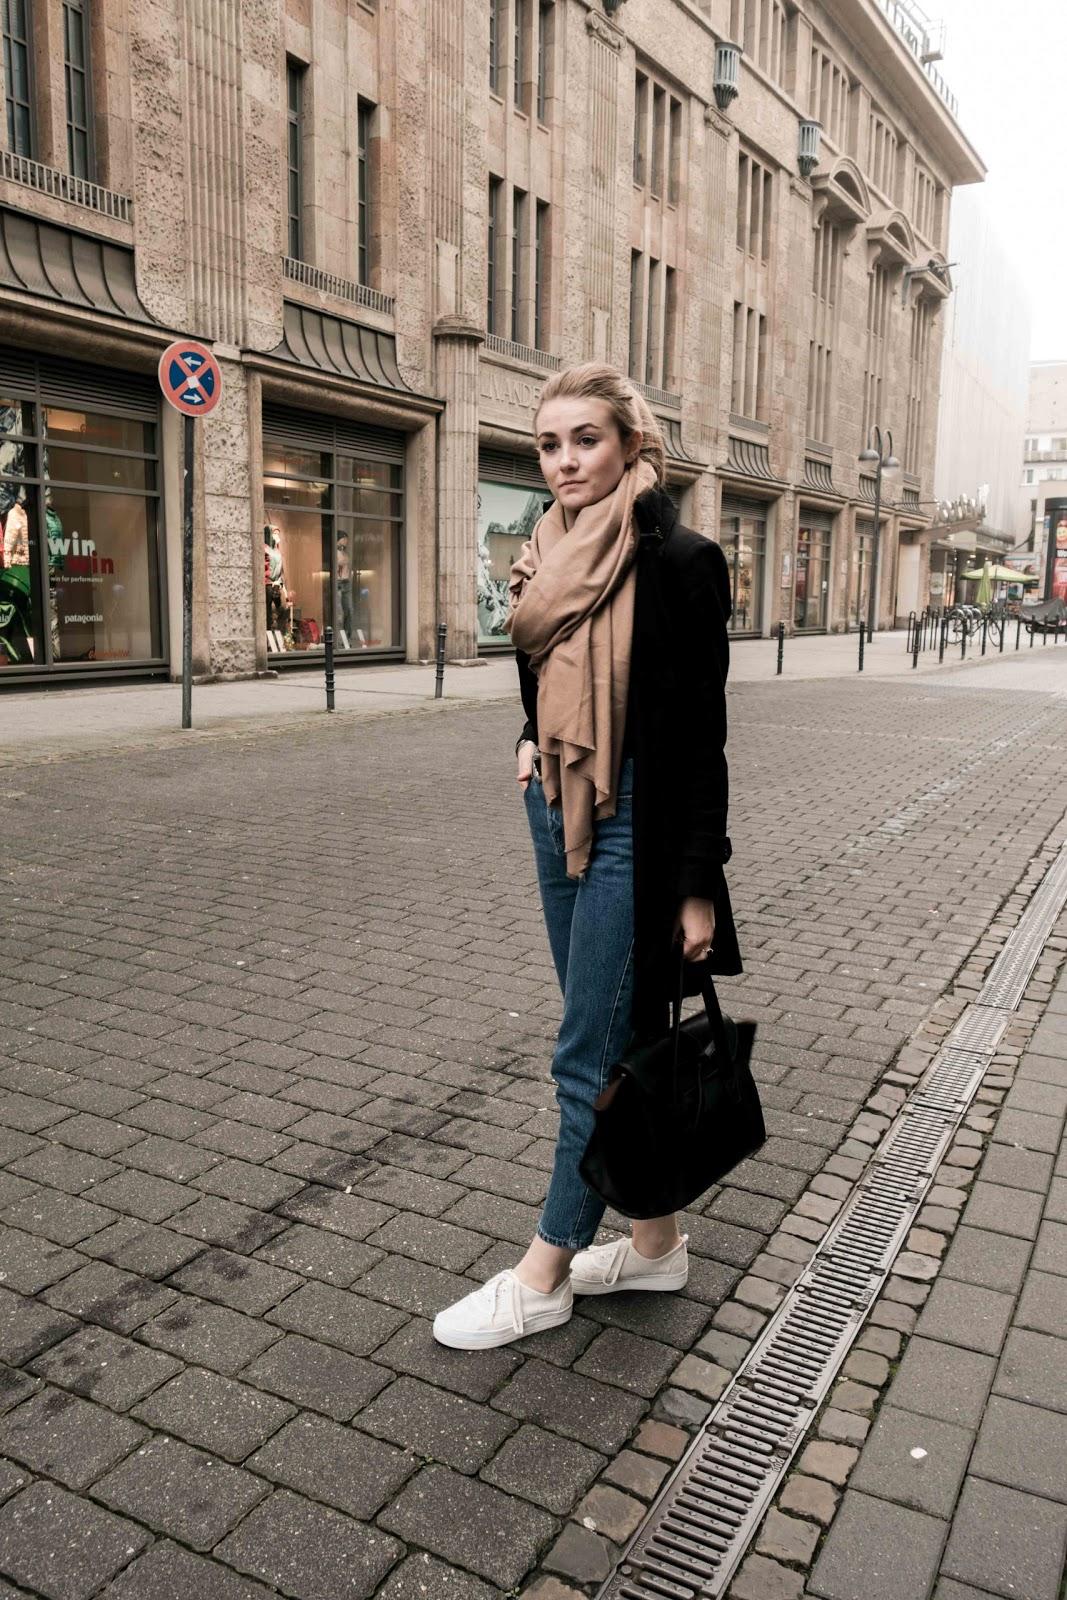 Little Emma, Zara, H&M, Mexx, ootd, Cologne, Fashionblogger